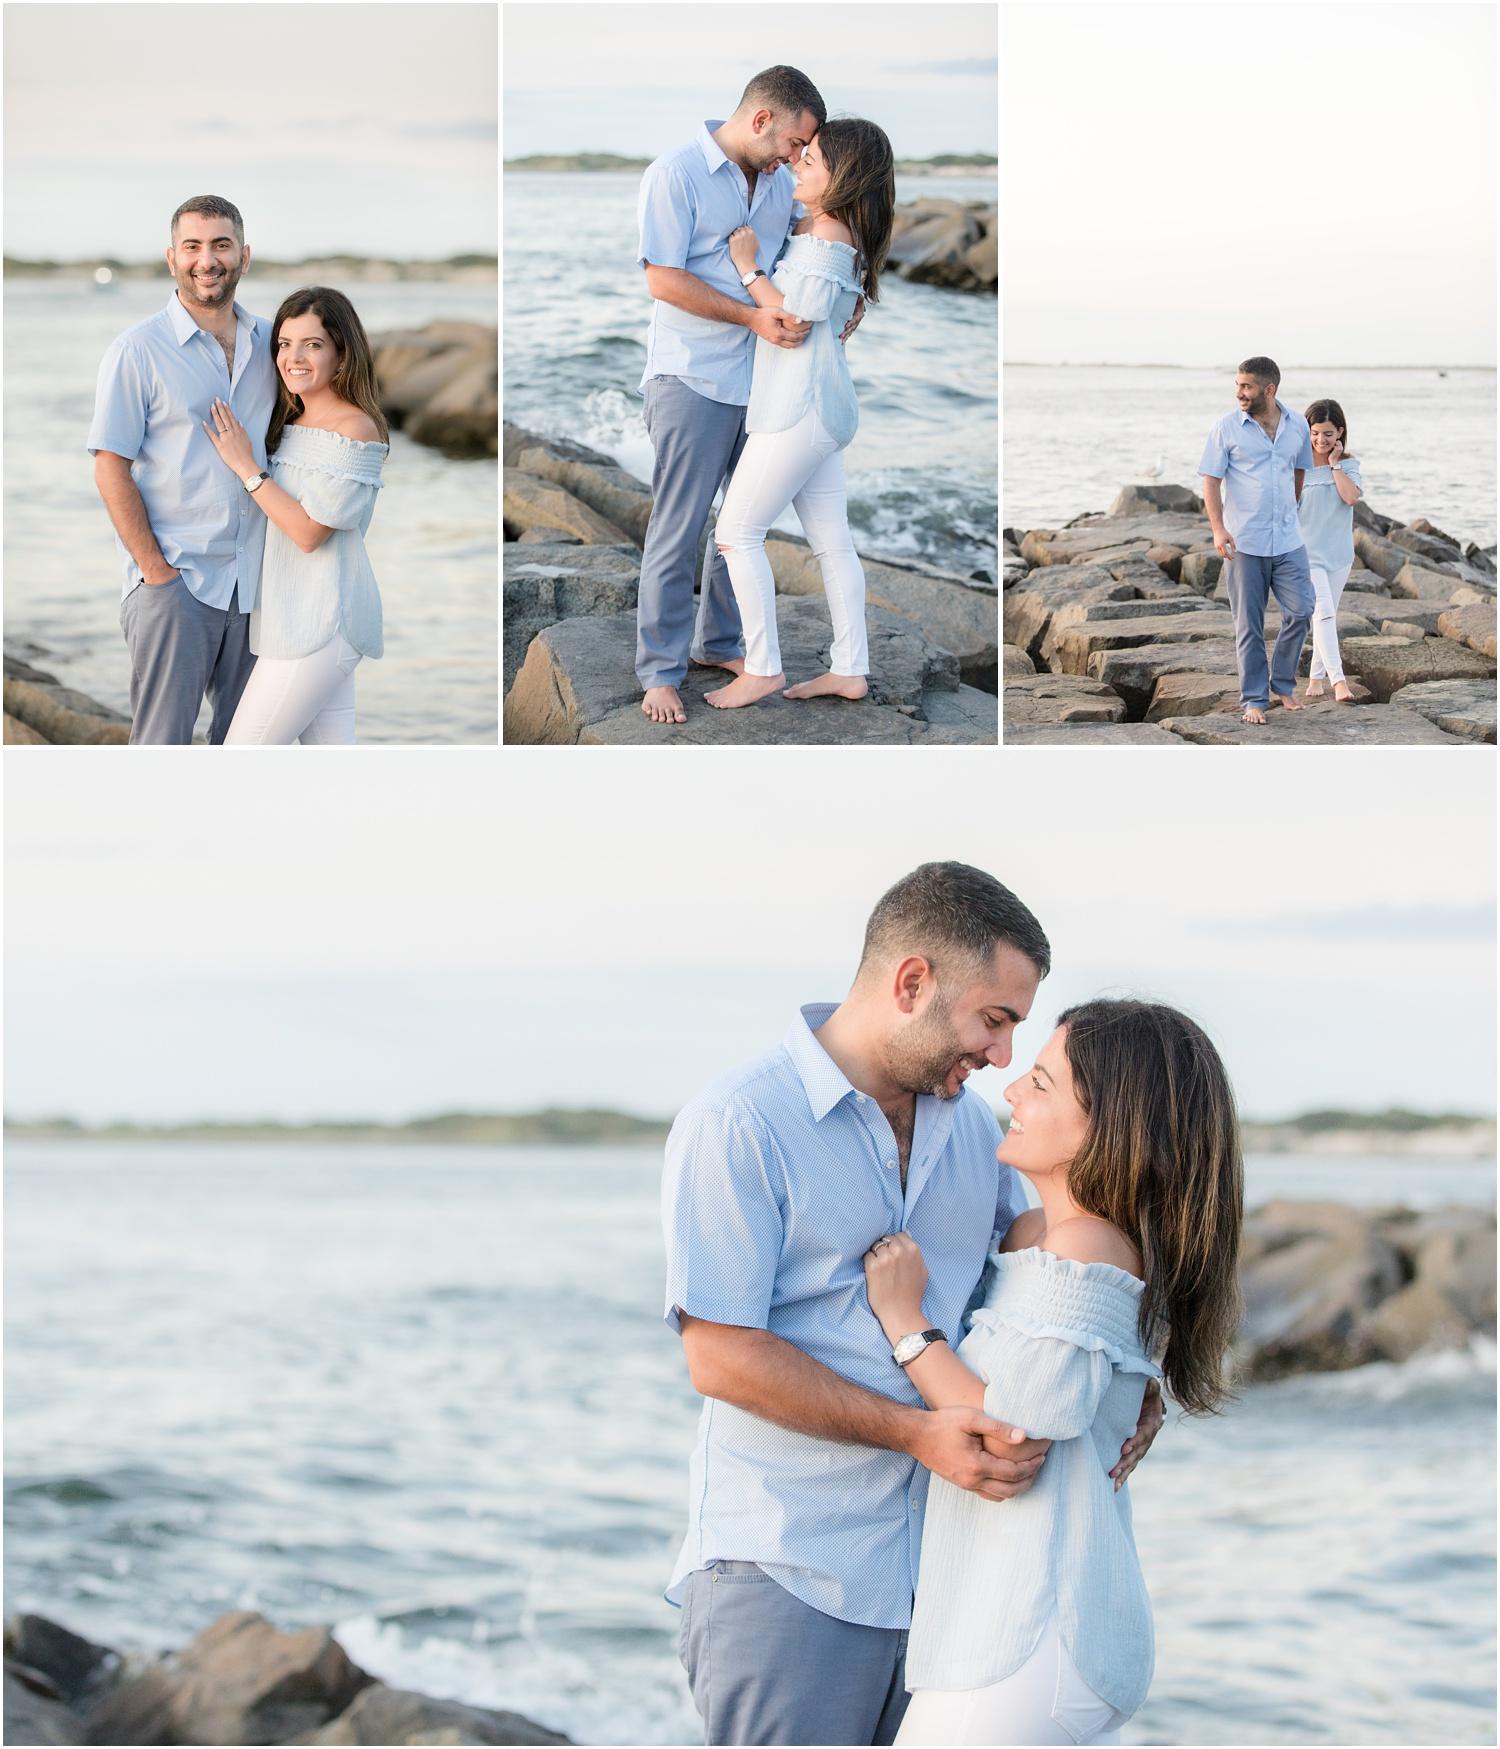 Engagement photos at Barnegat Light in LBI